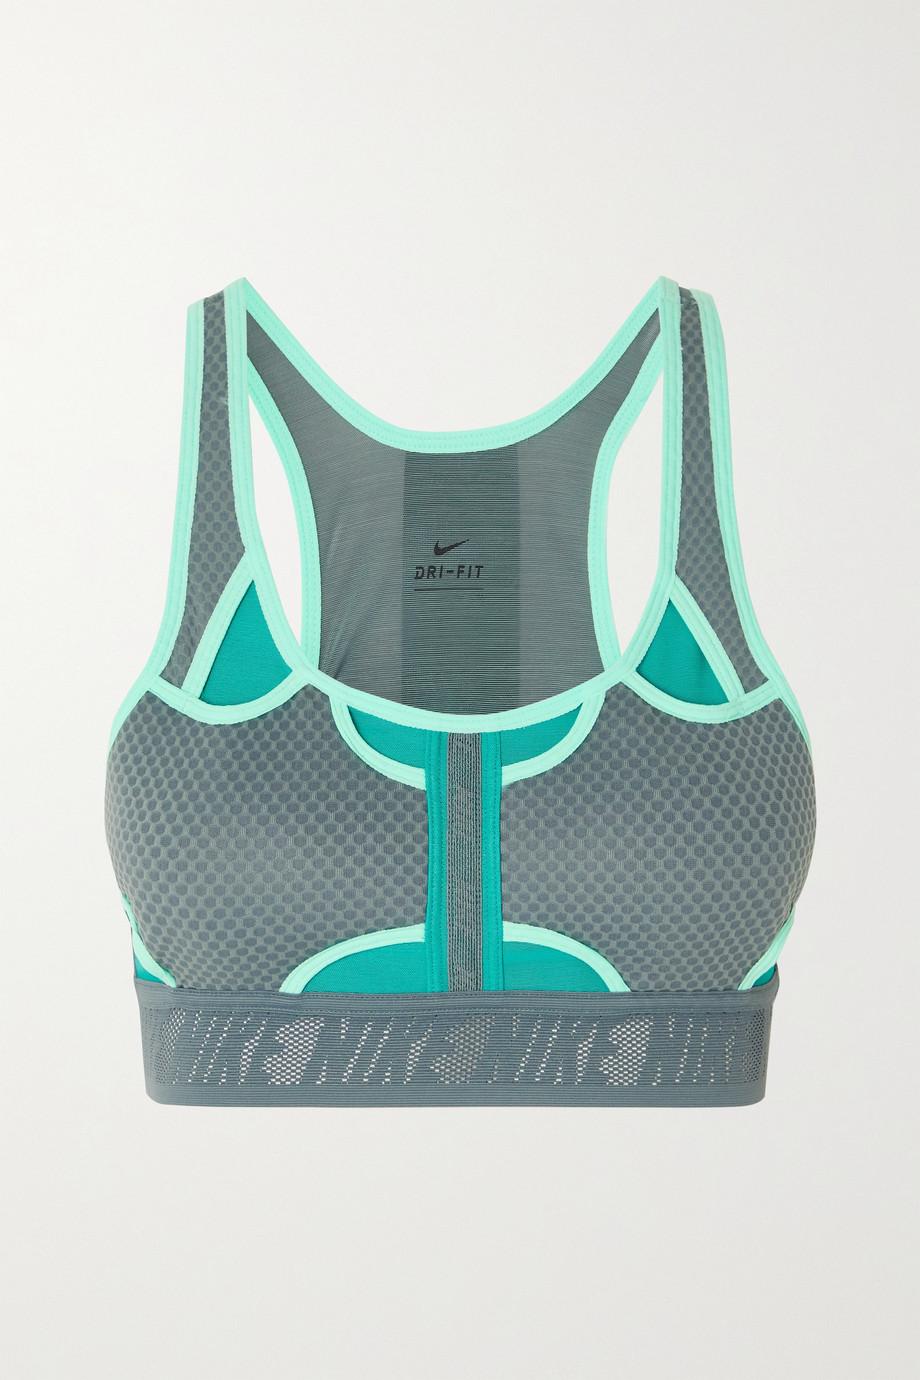 Nike Swoosh UltraBreathe cutout mesh-paneled Dri-FIT sports bra